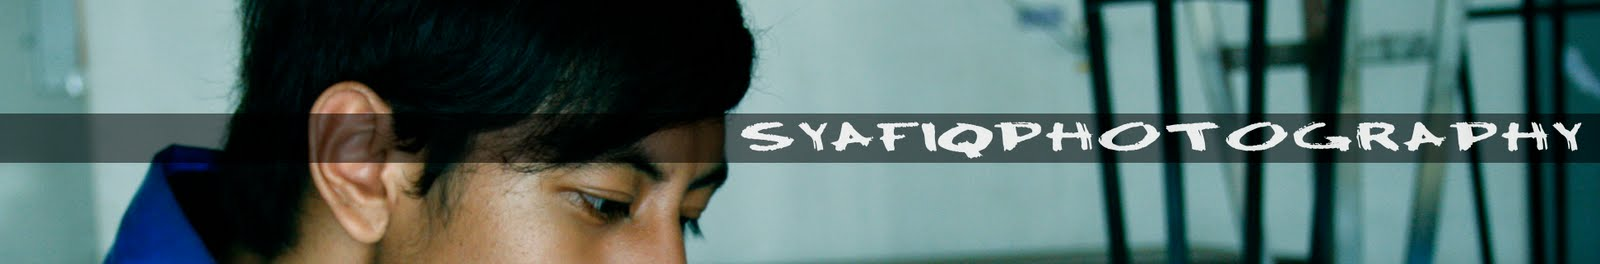 syafiqphotogalleries !